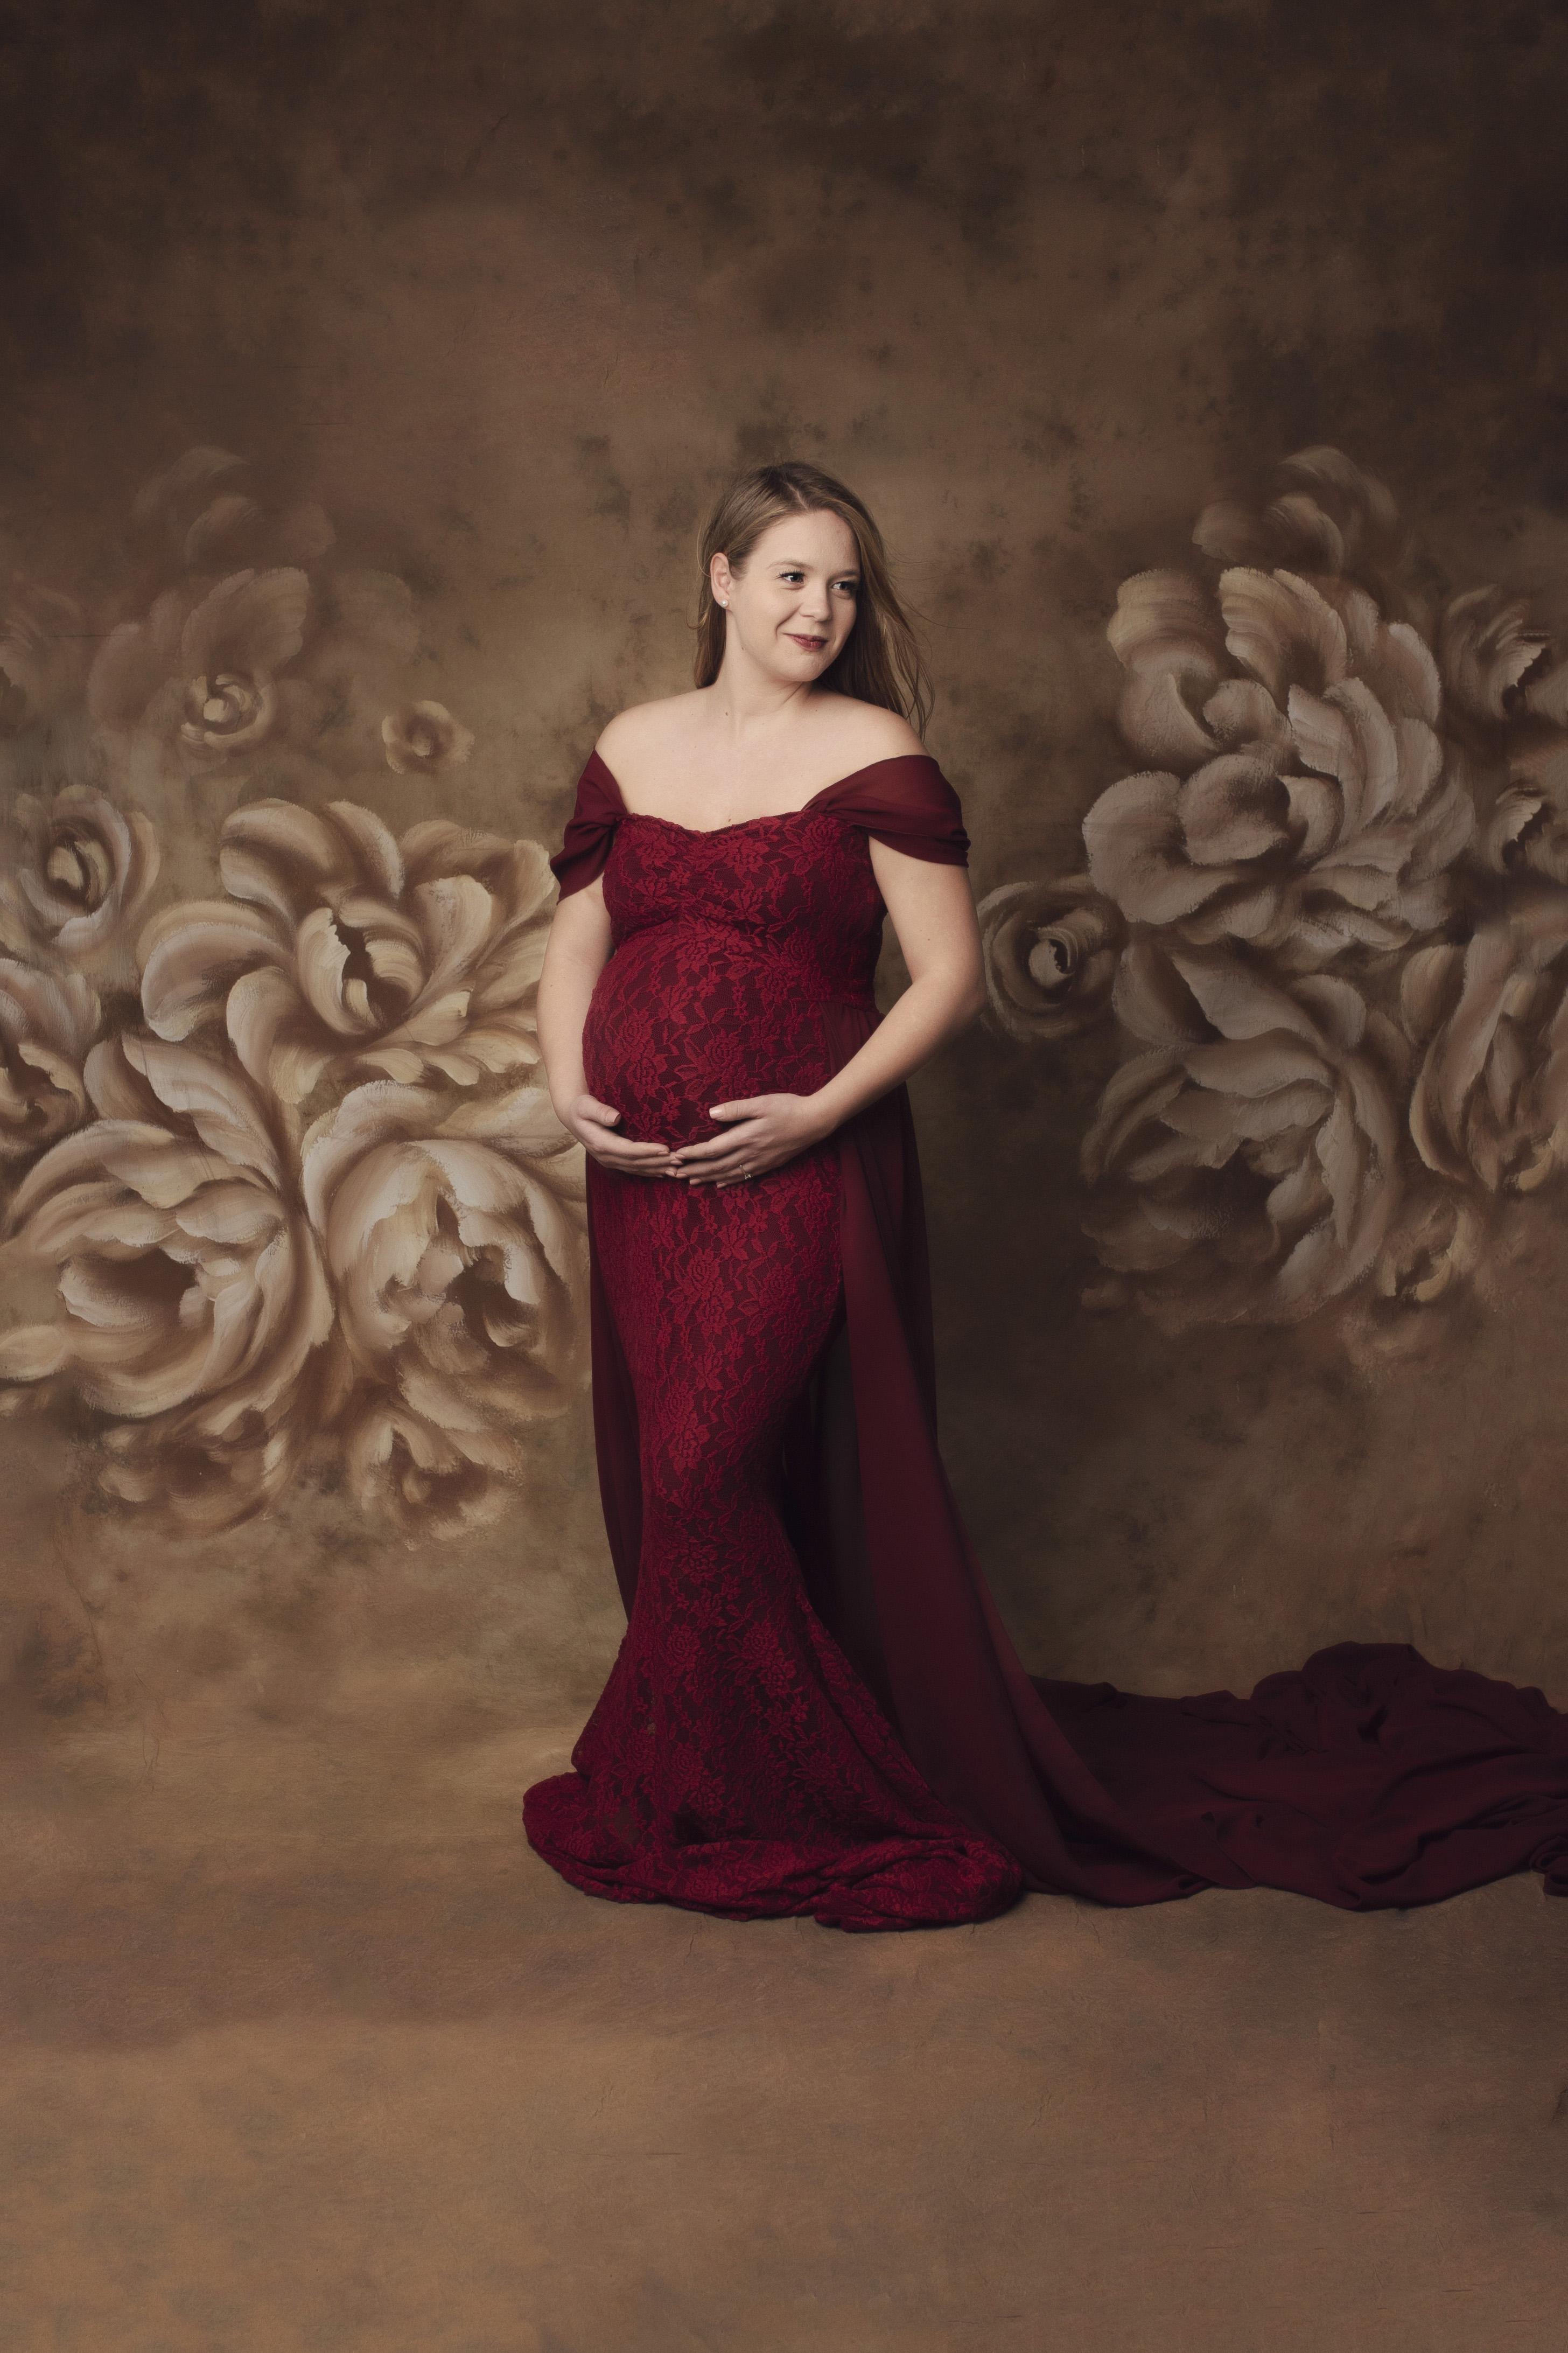 grand rapids michigan fine art maternity photography